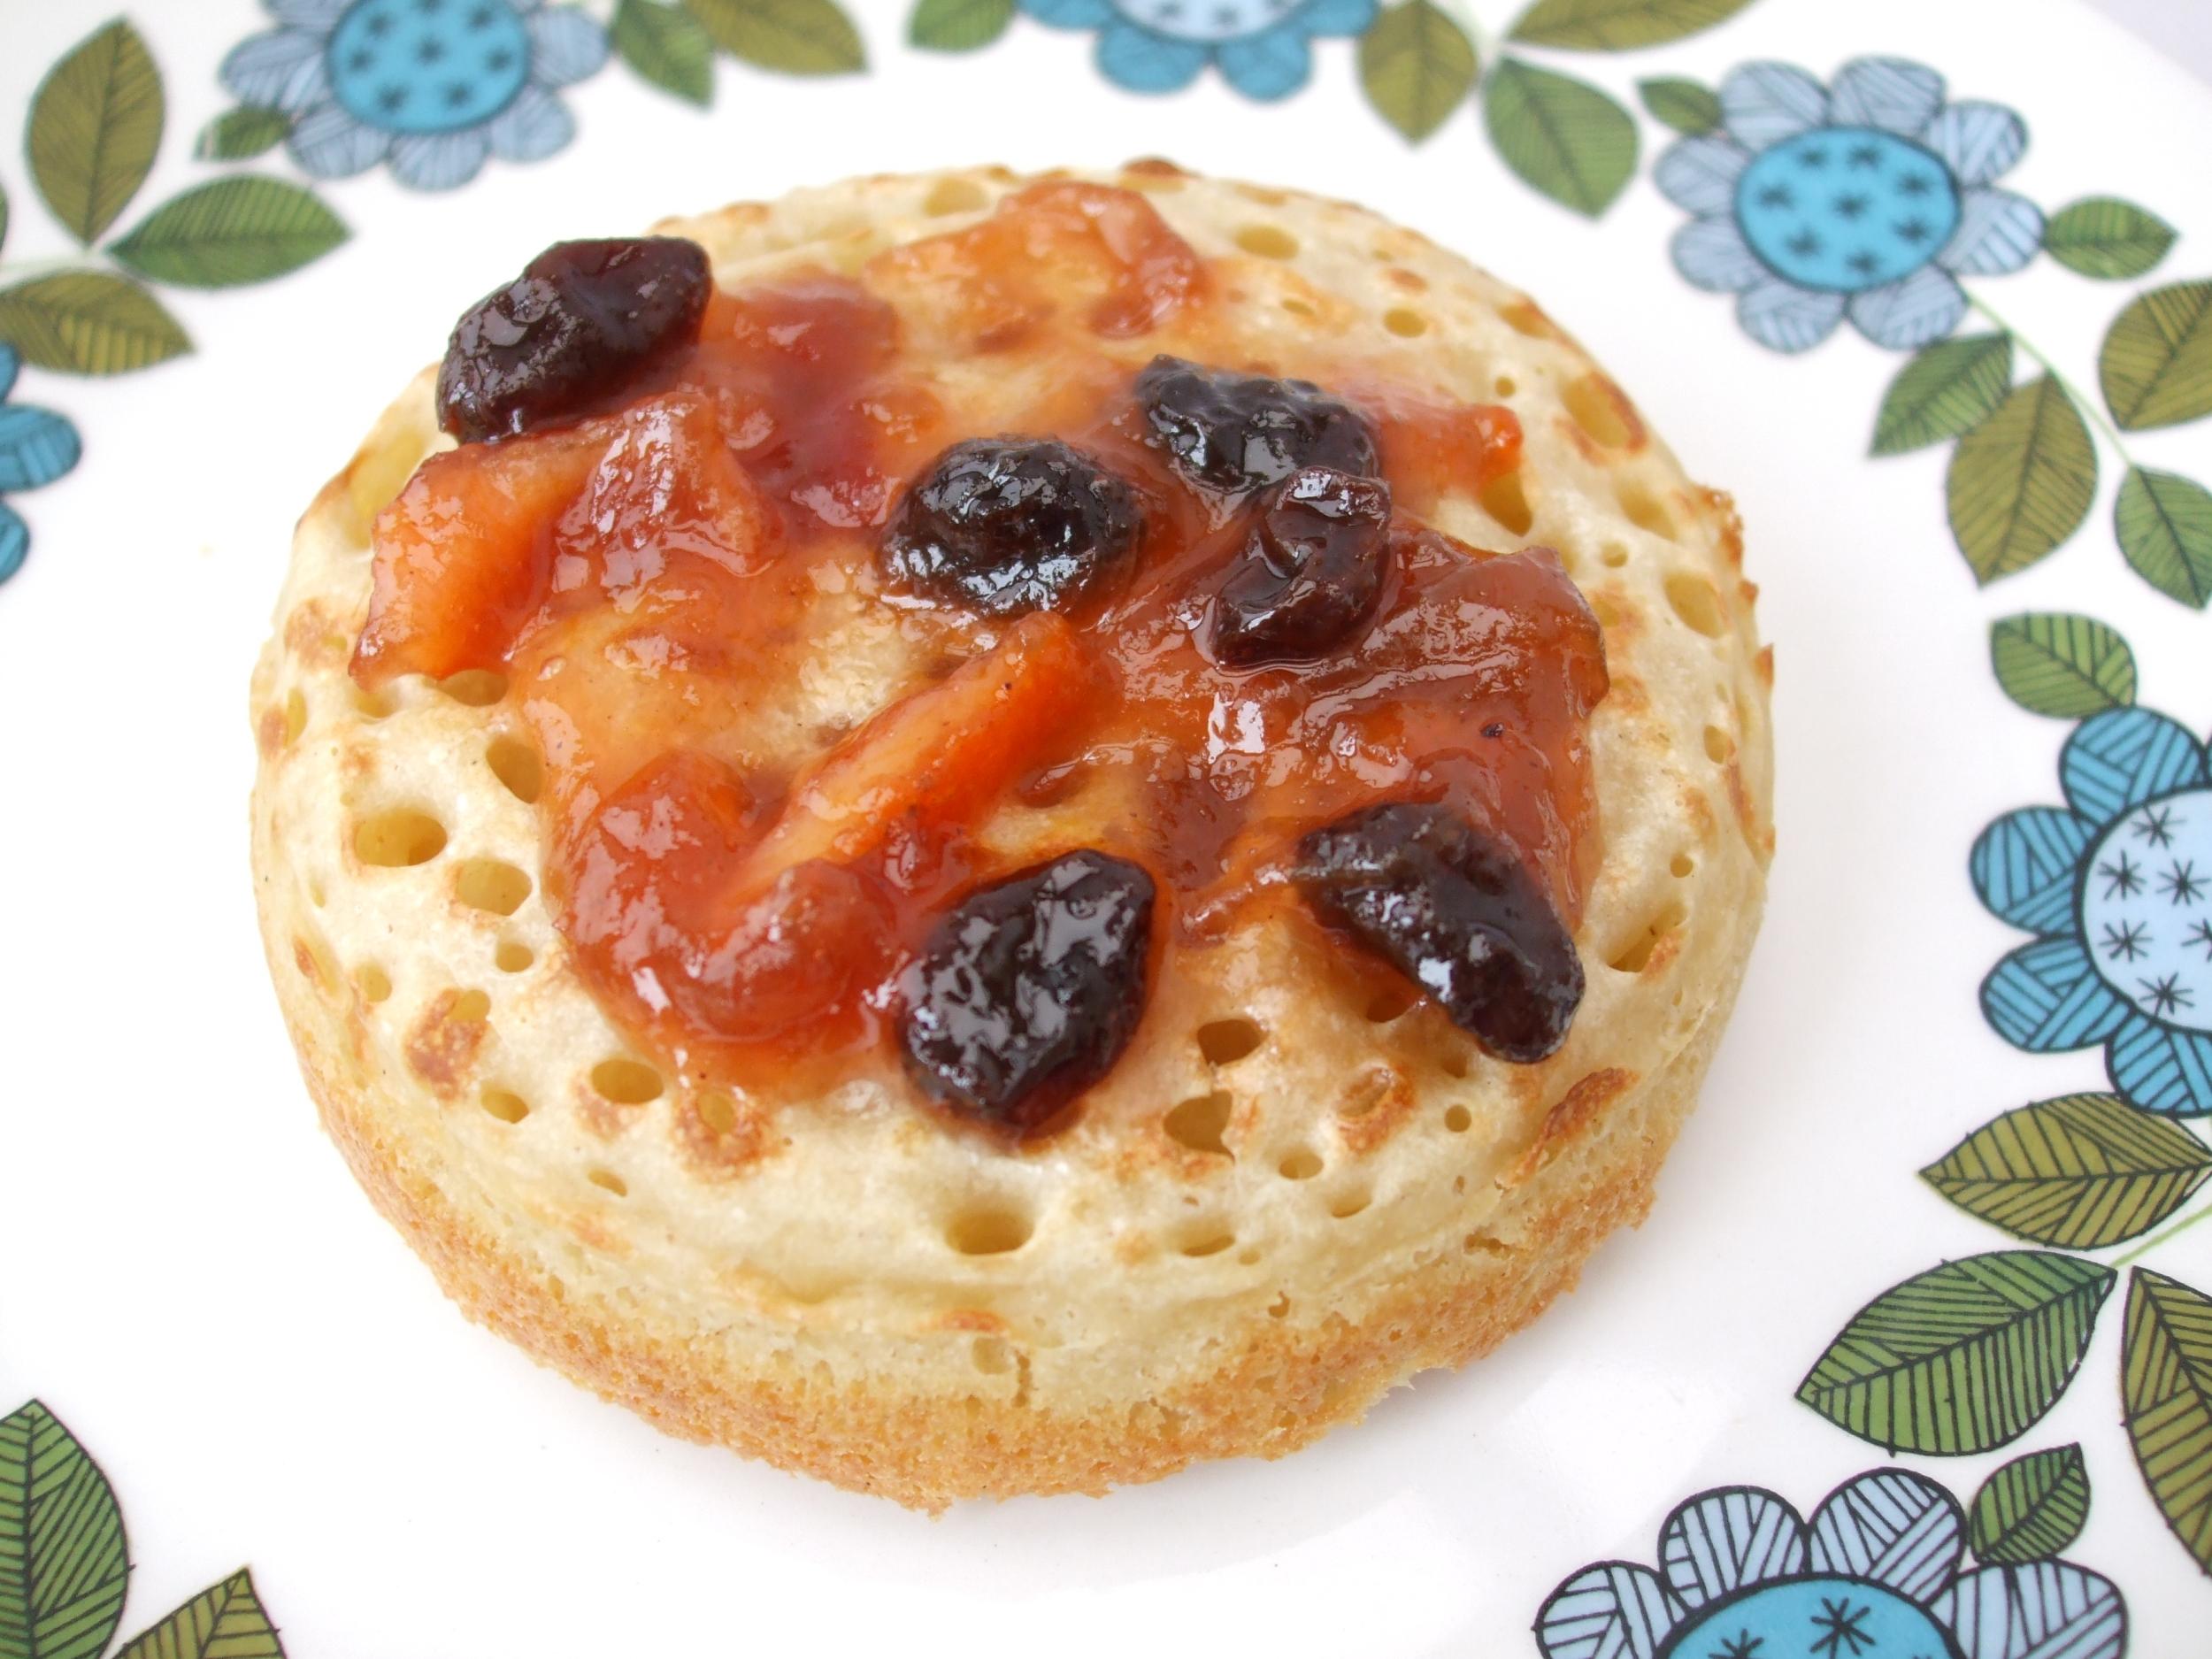 Home-made crumpet and rhubarb jam